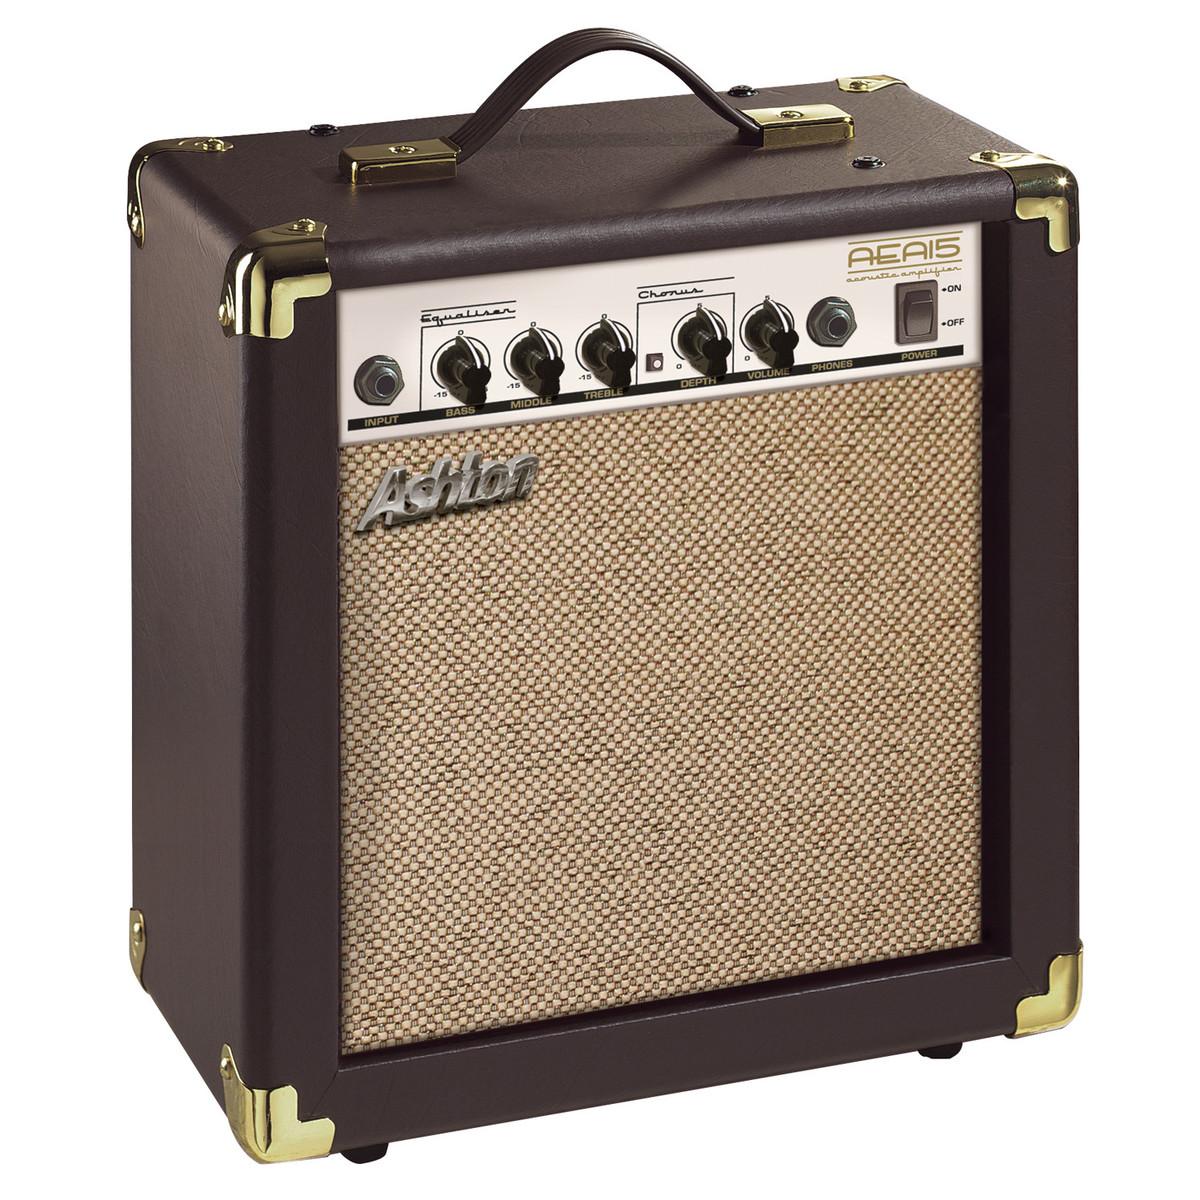 ashton aea15 acoustic guitar amplifier at gear4music. Black Bedroom Furniture Sets. Home Design Ideas